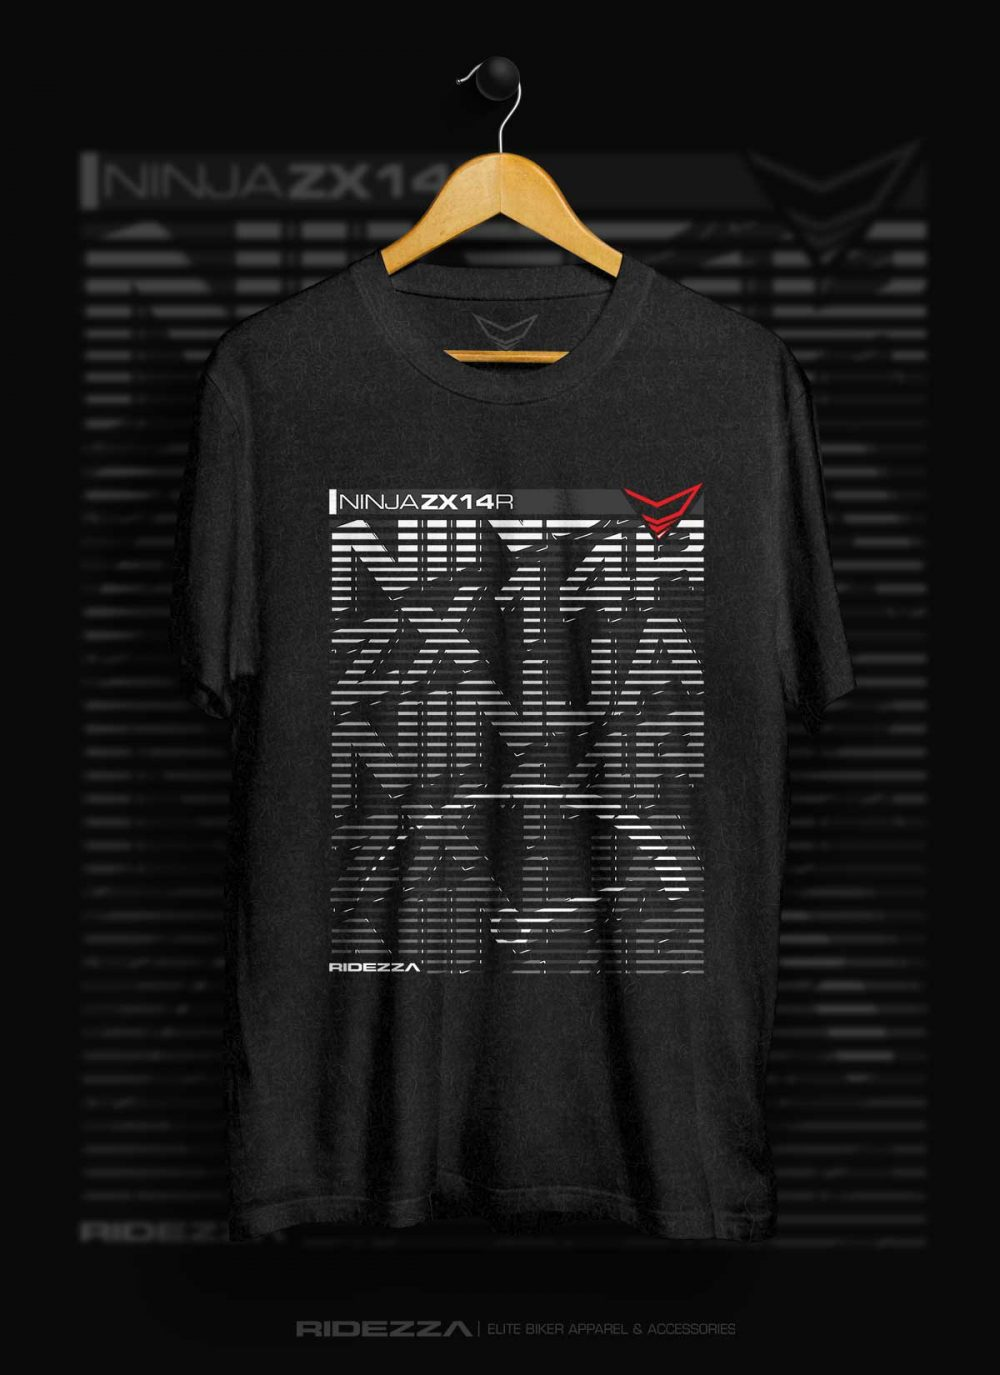 Kawasaki Ninja ZX14R Speedy T-Shirt